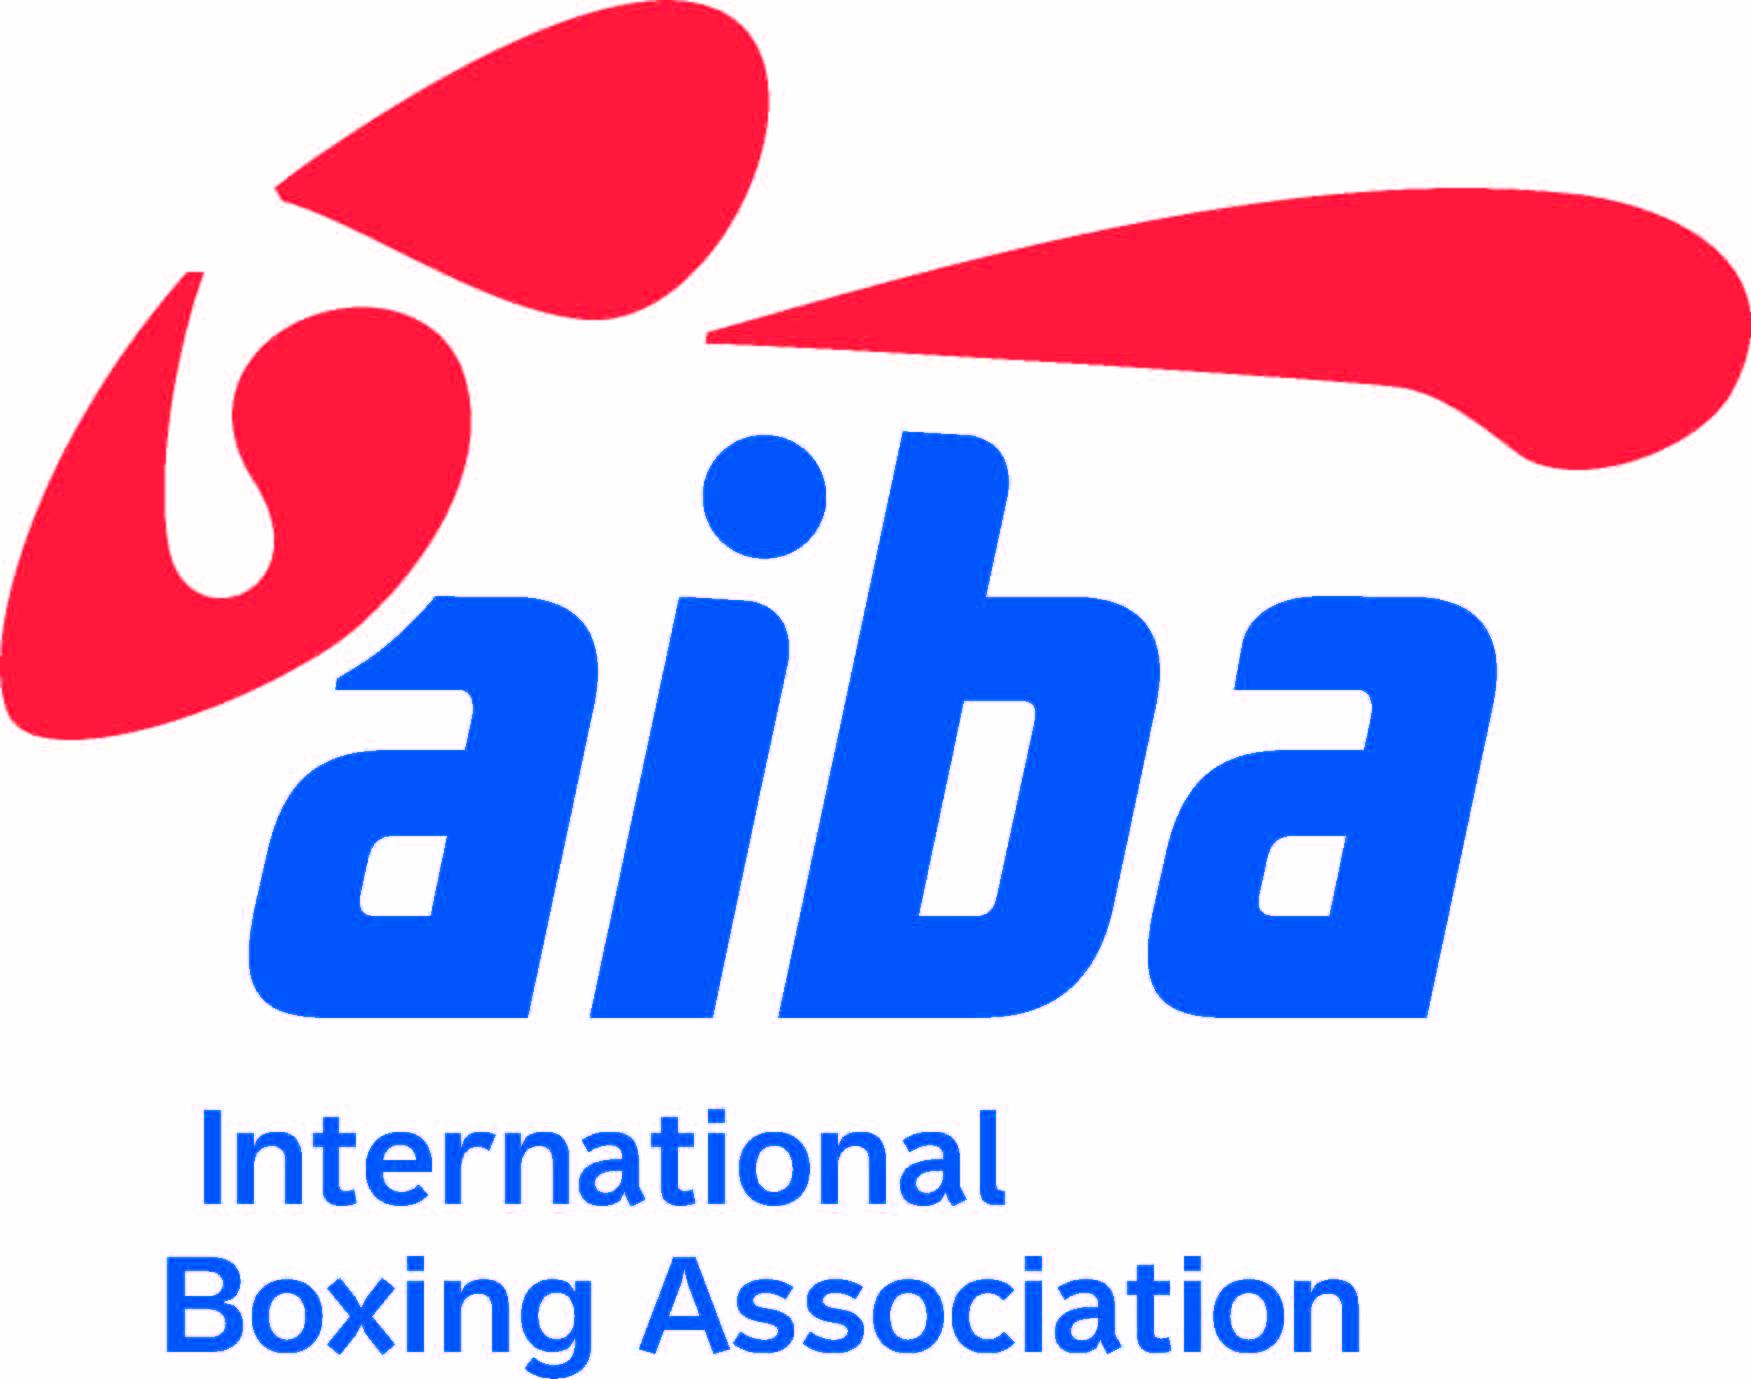 Comité Ejecutivo de AIBA discutirá celebración de Congreso virtual para elegir nuevo presidente